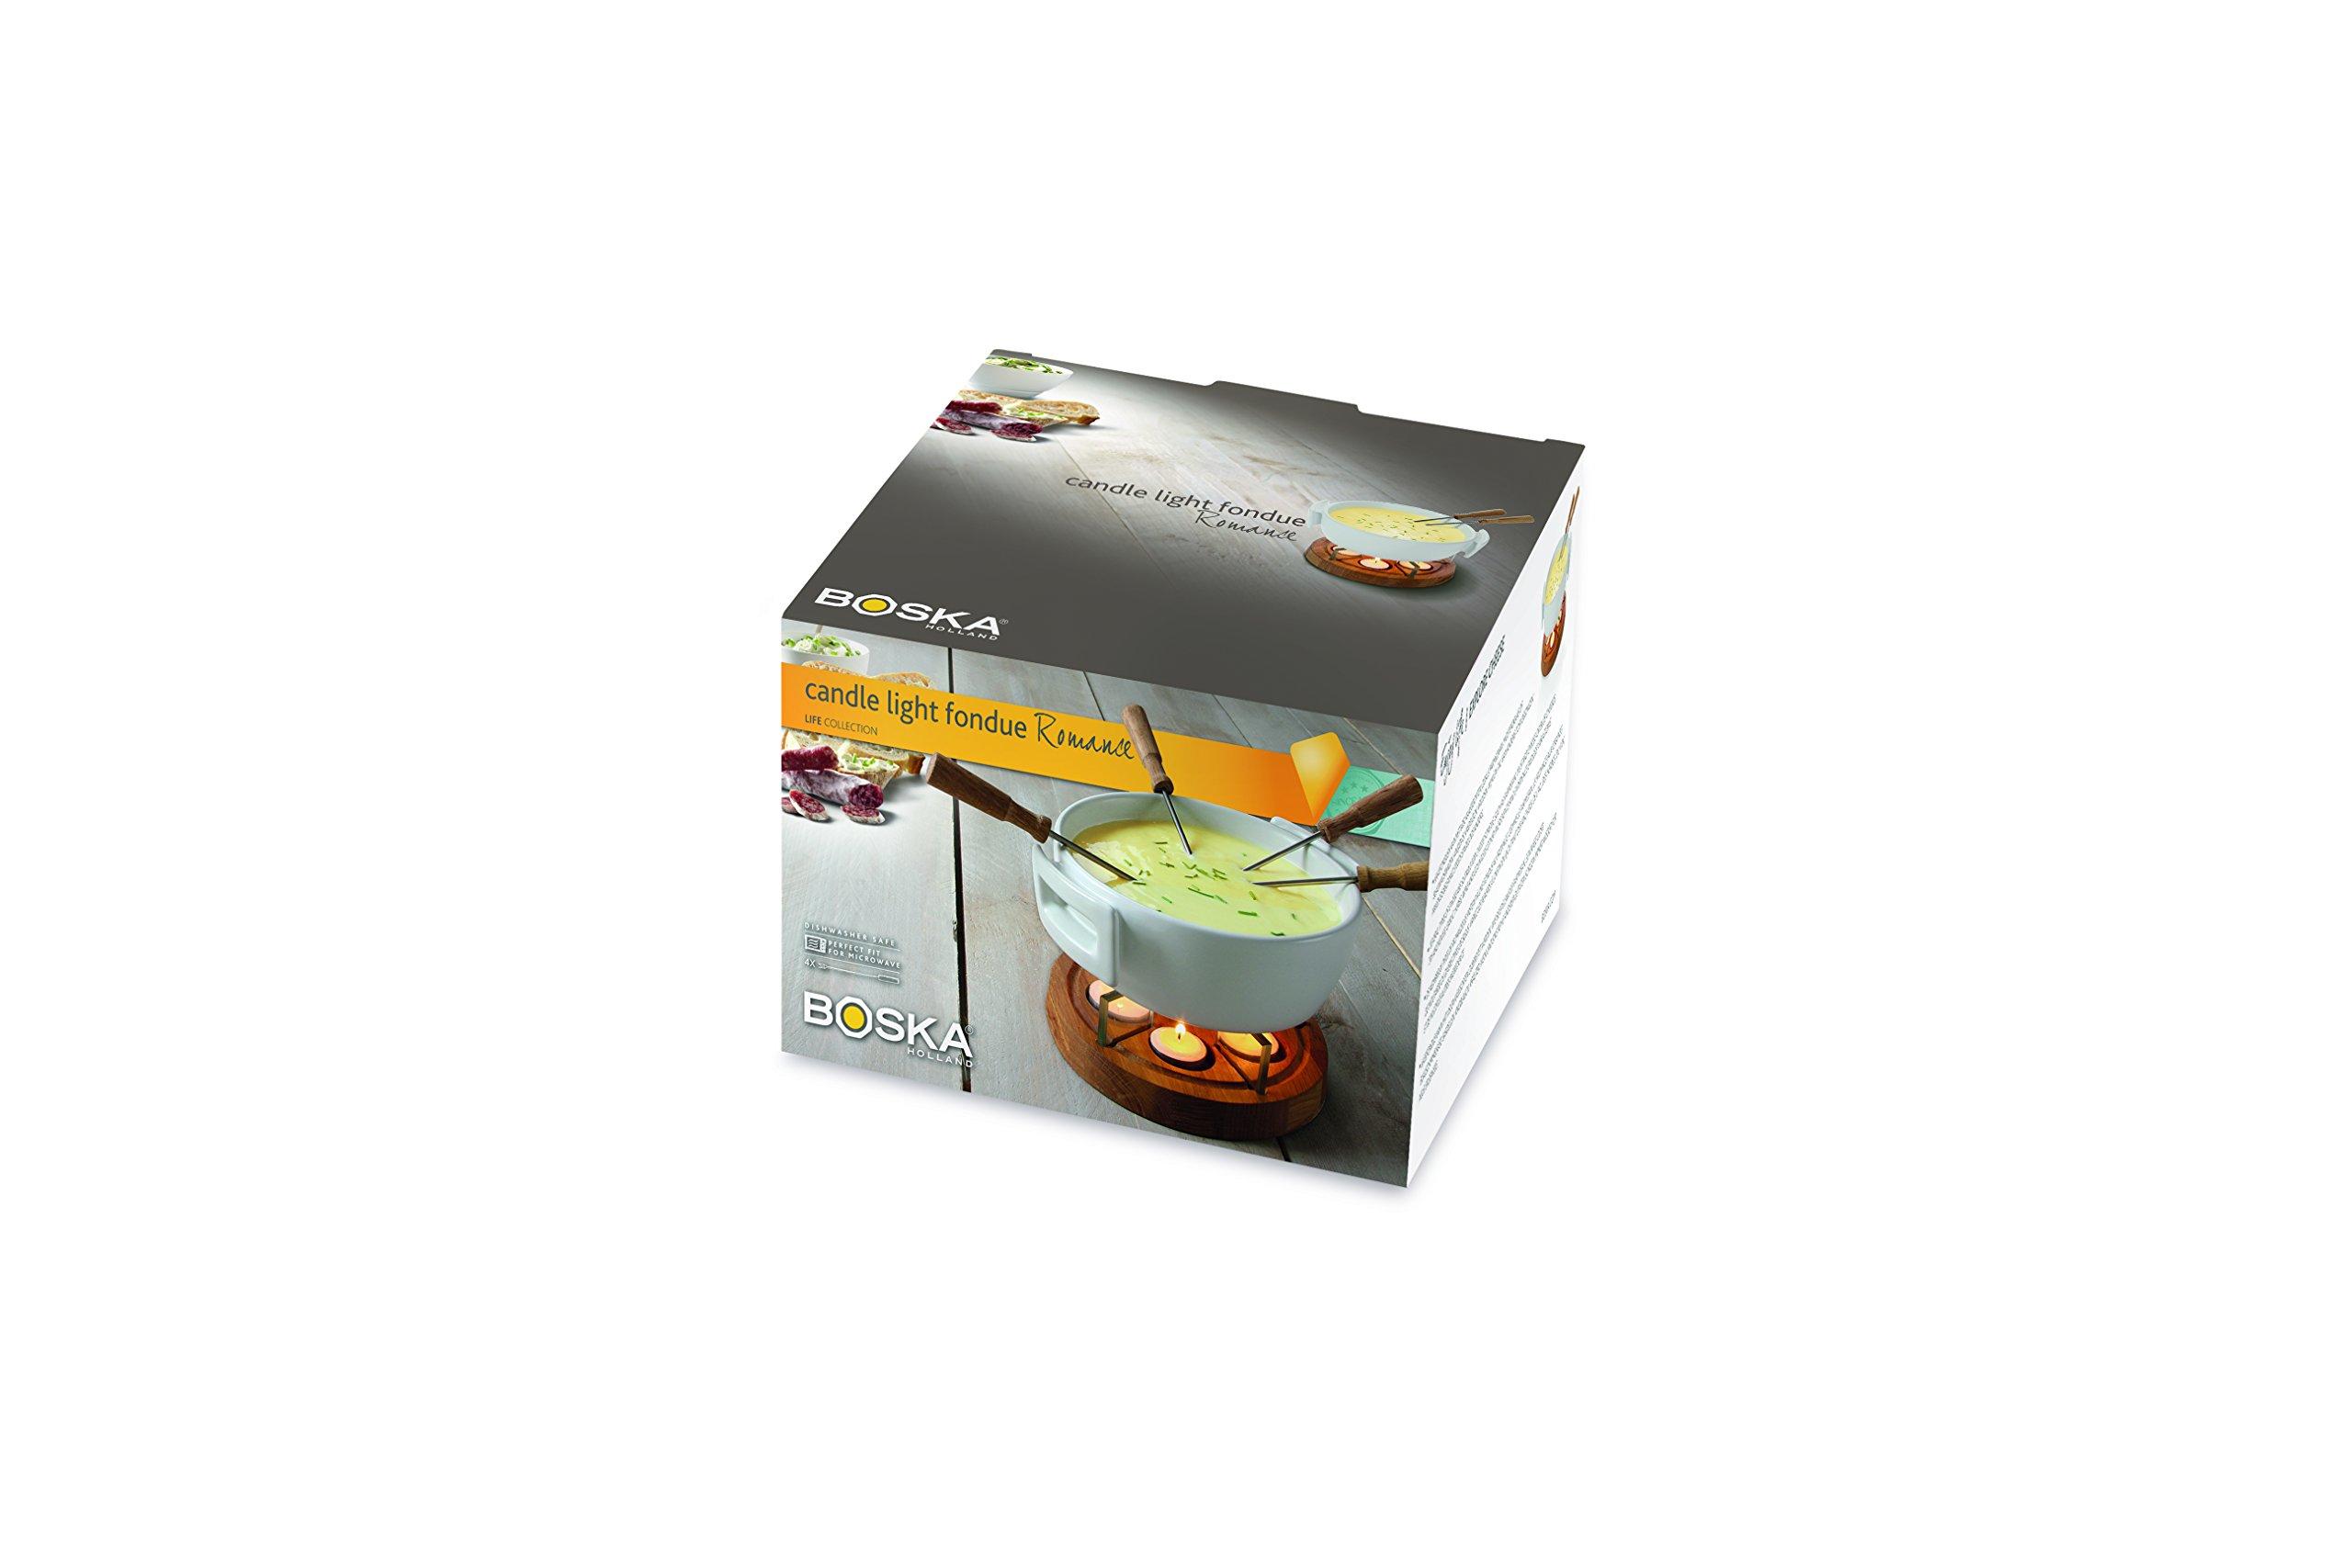 Boska Holland Tea Light Fondue Set with Oak Wood Base, 1 L White Stoneware Pot, Life Collection by Boska Holland (Image #3)